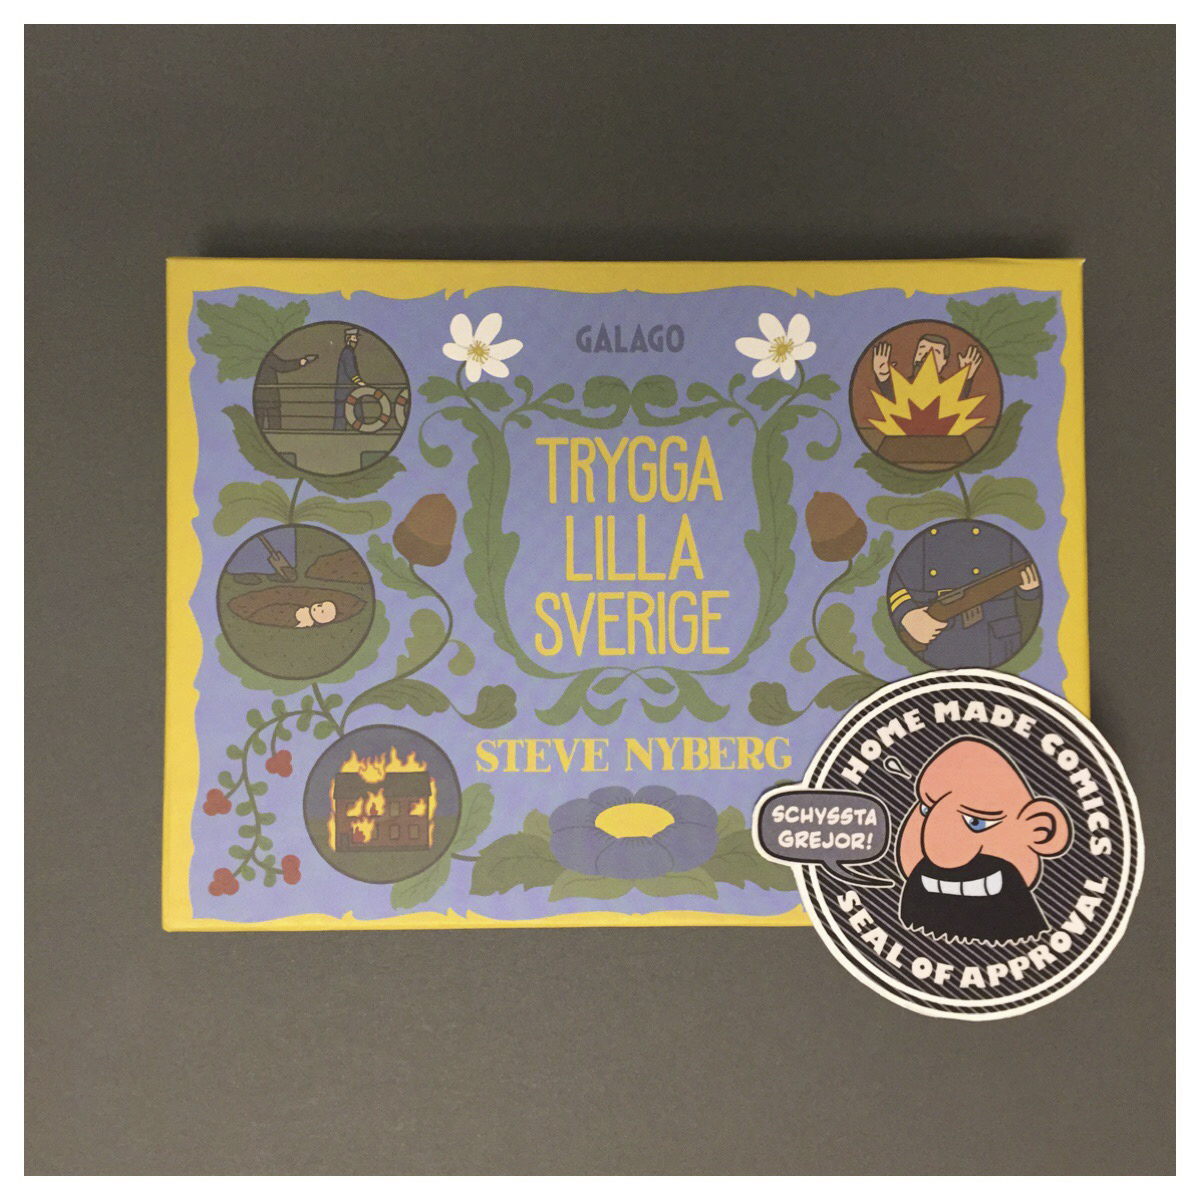 Home Made Comics Seal of Approval #209. Trygga lilla Sverige av Steve Nyberg utgiven av Galago 2016.